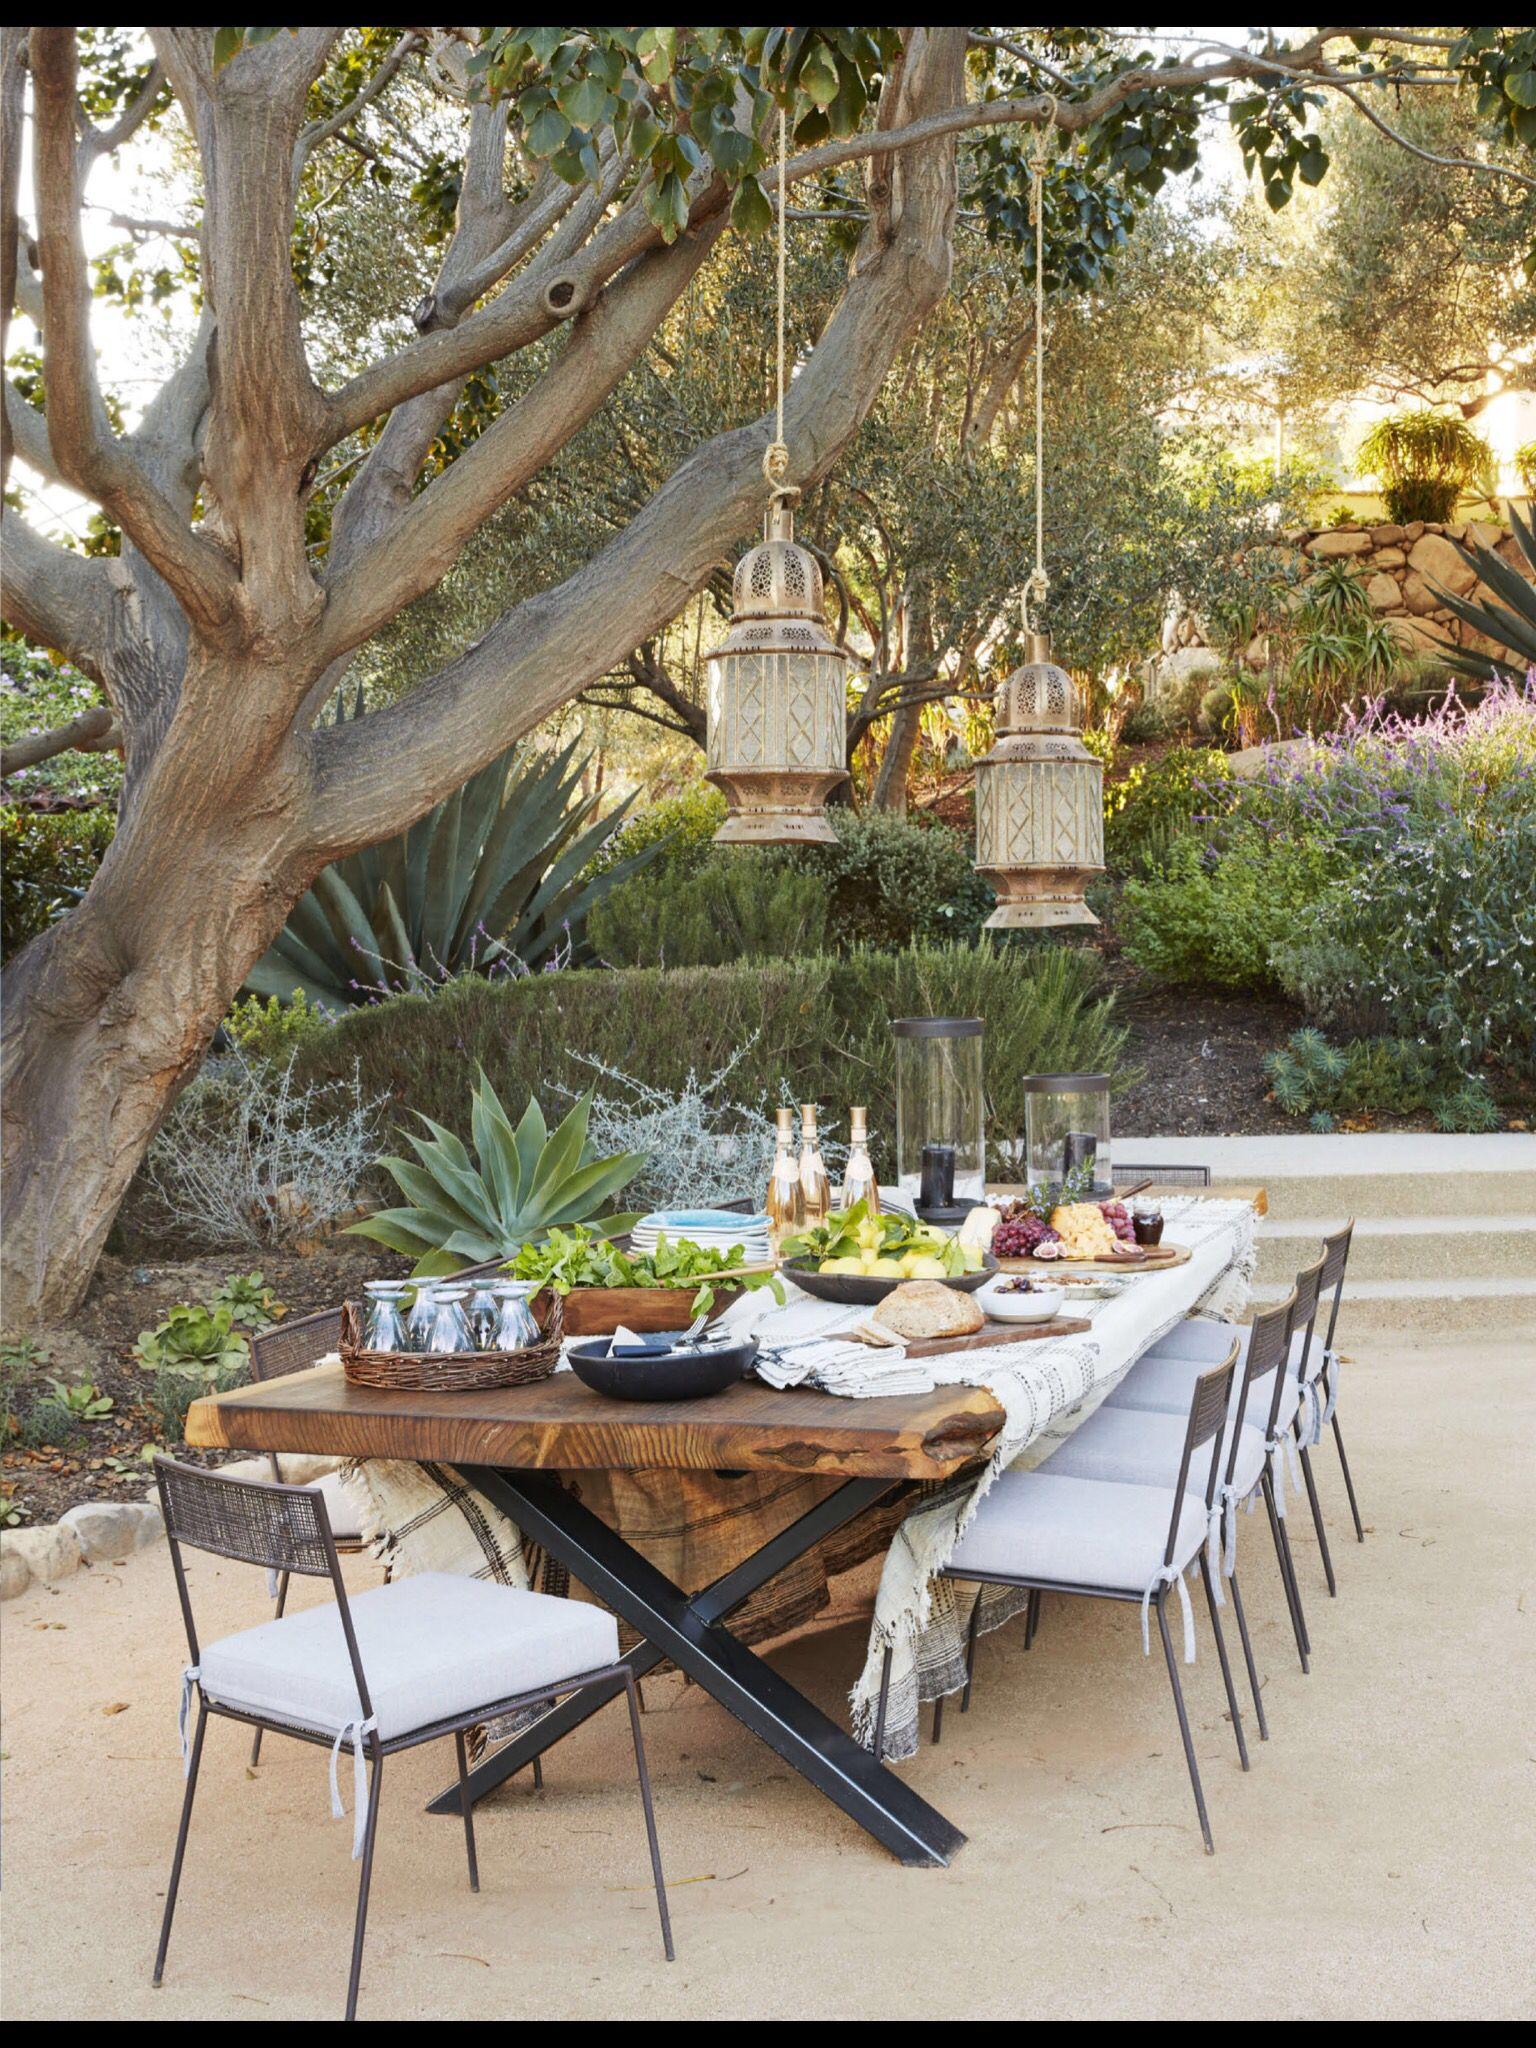 Backyard Dining Exquisite Area